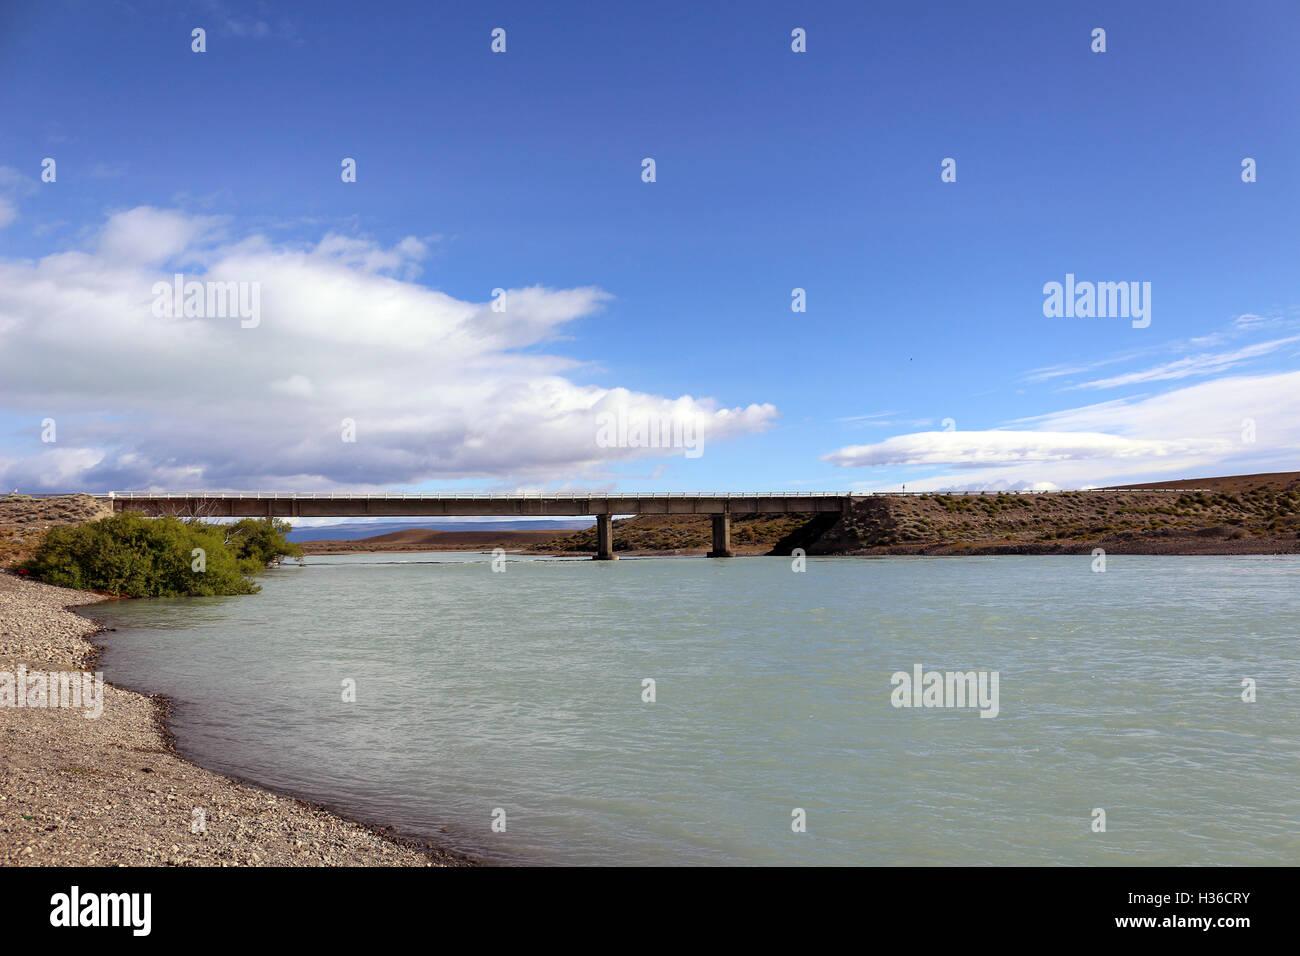 Route 40 bridge over the La Leóna river in Santa Cruz, Patagonia, Argentina - Stock Image